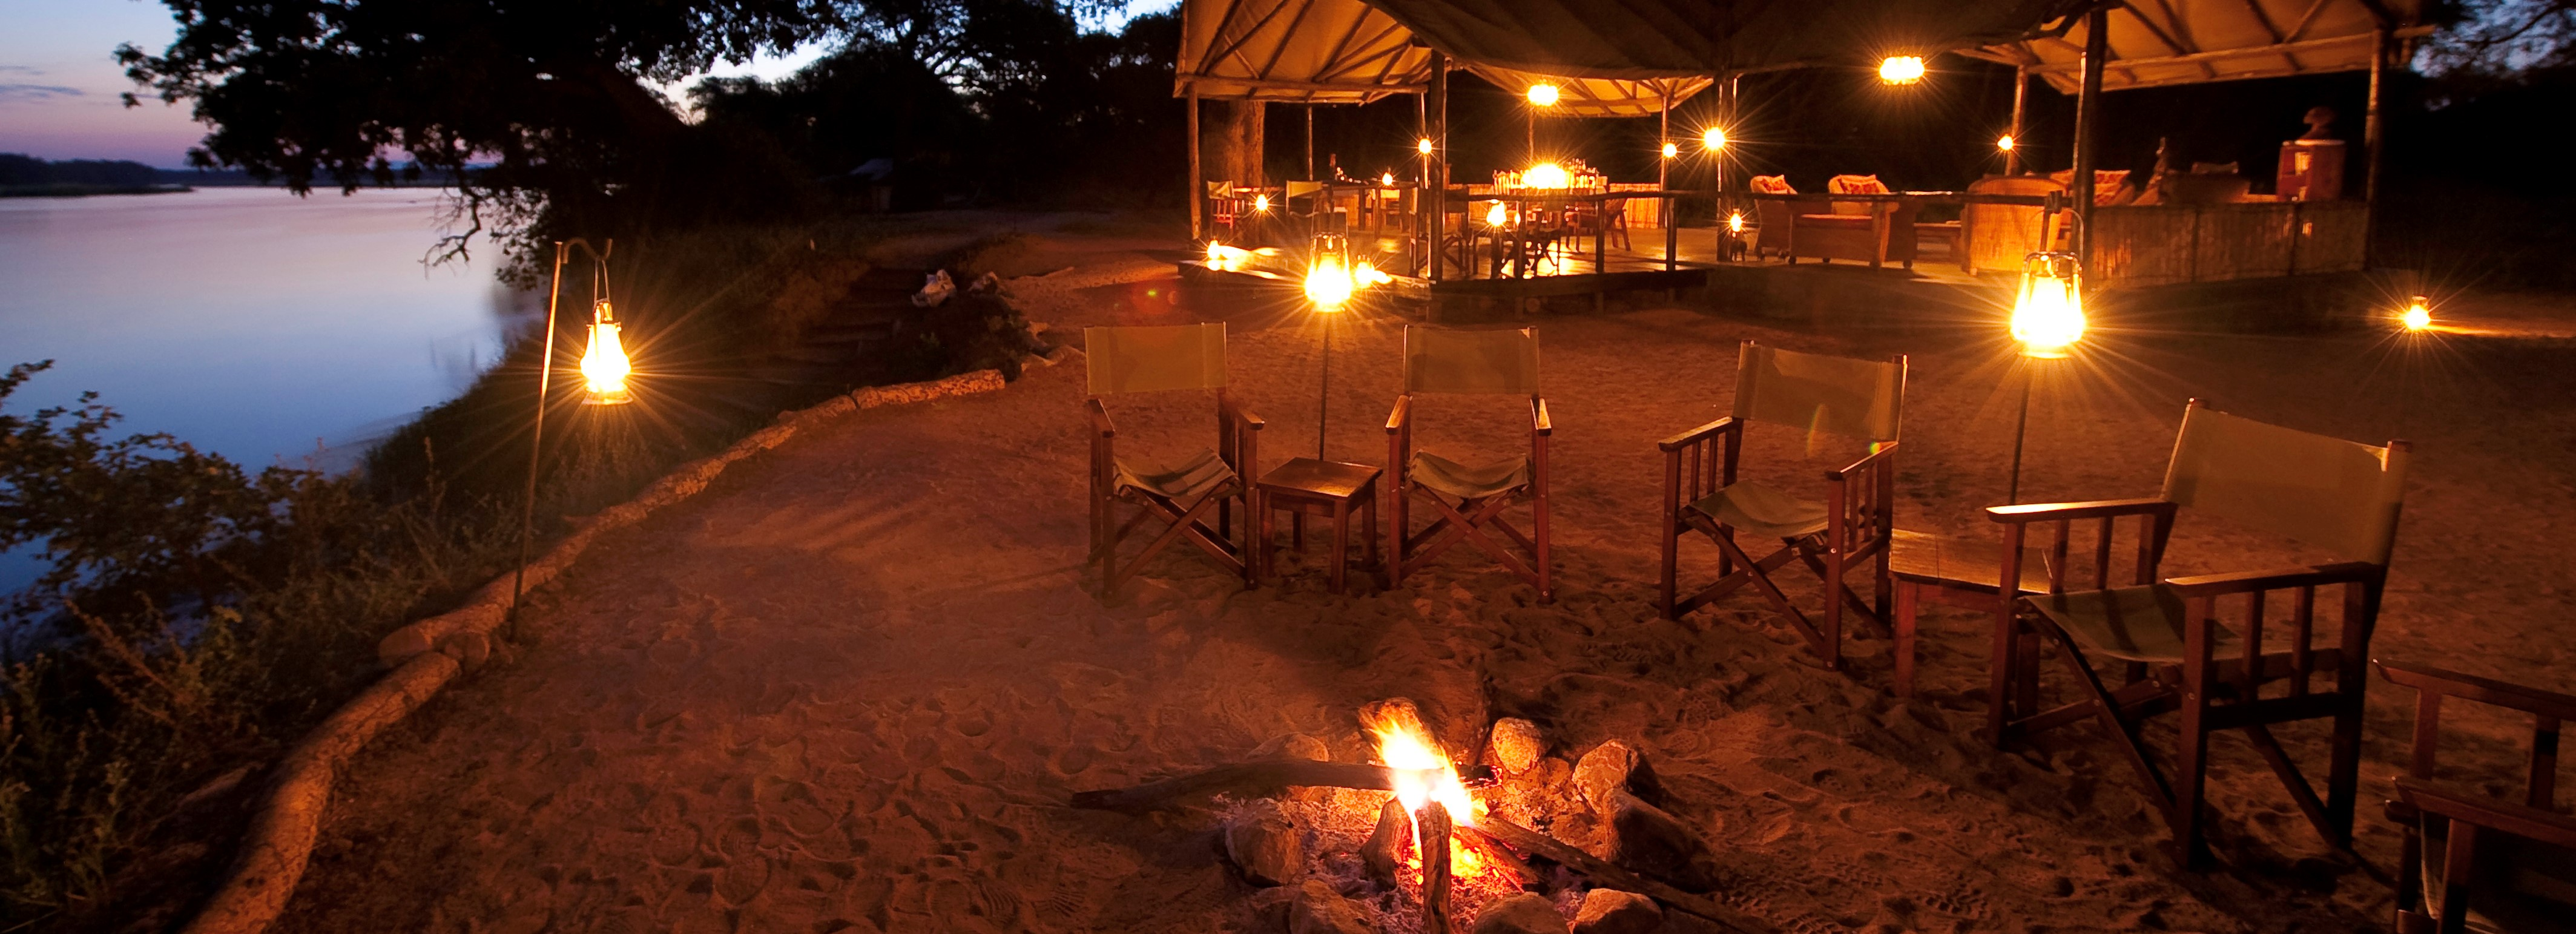 old-mondoro-safari-camp-fireside-seating